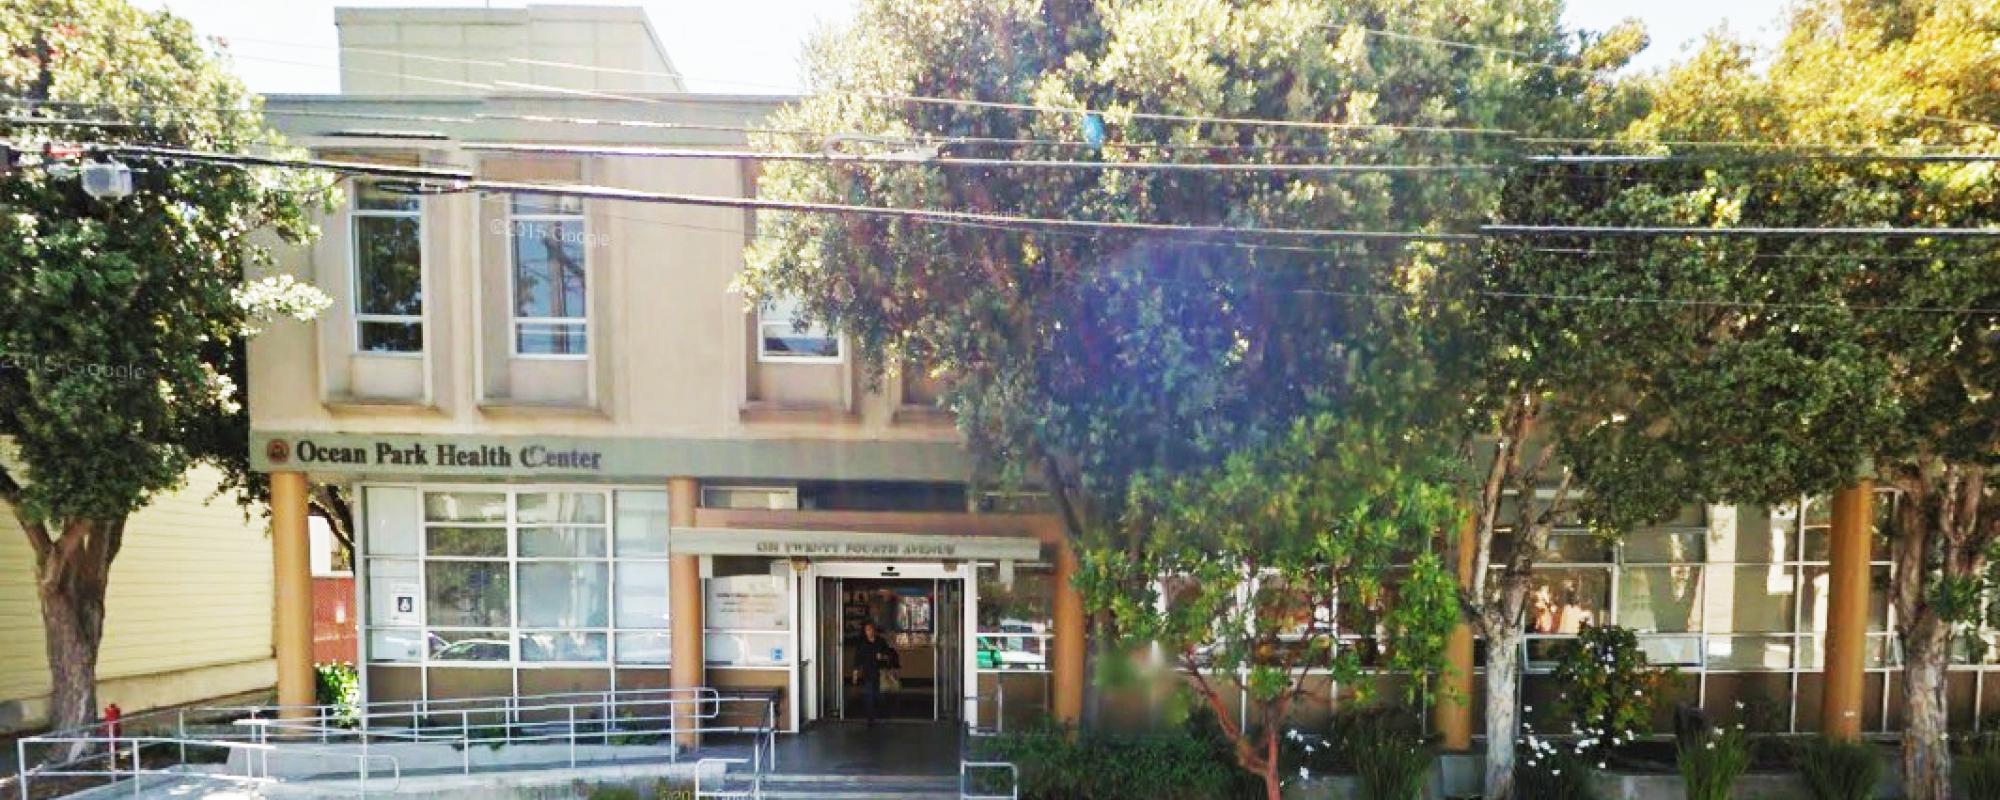 Ocean Park Health Center